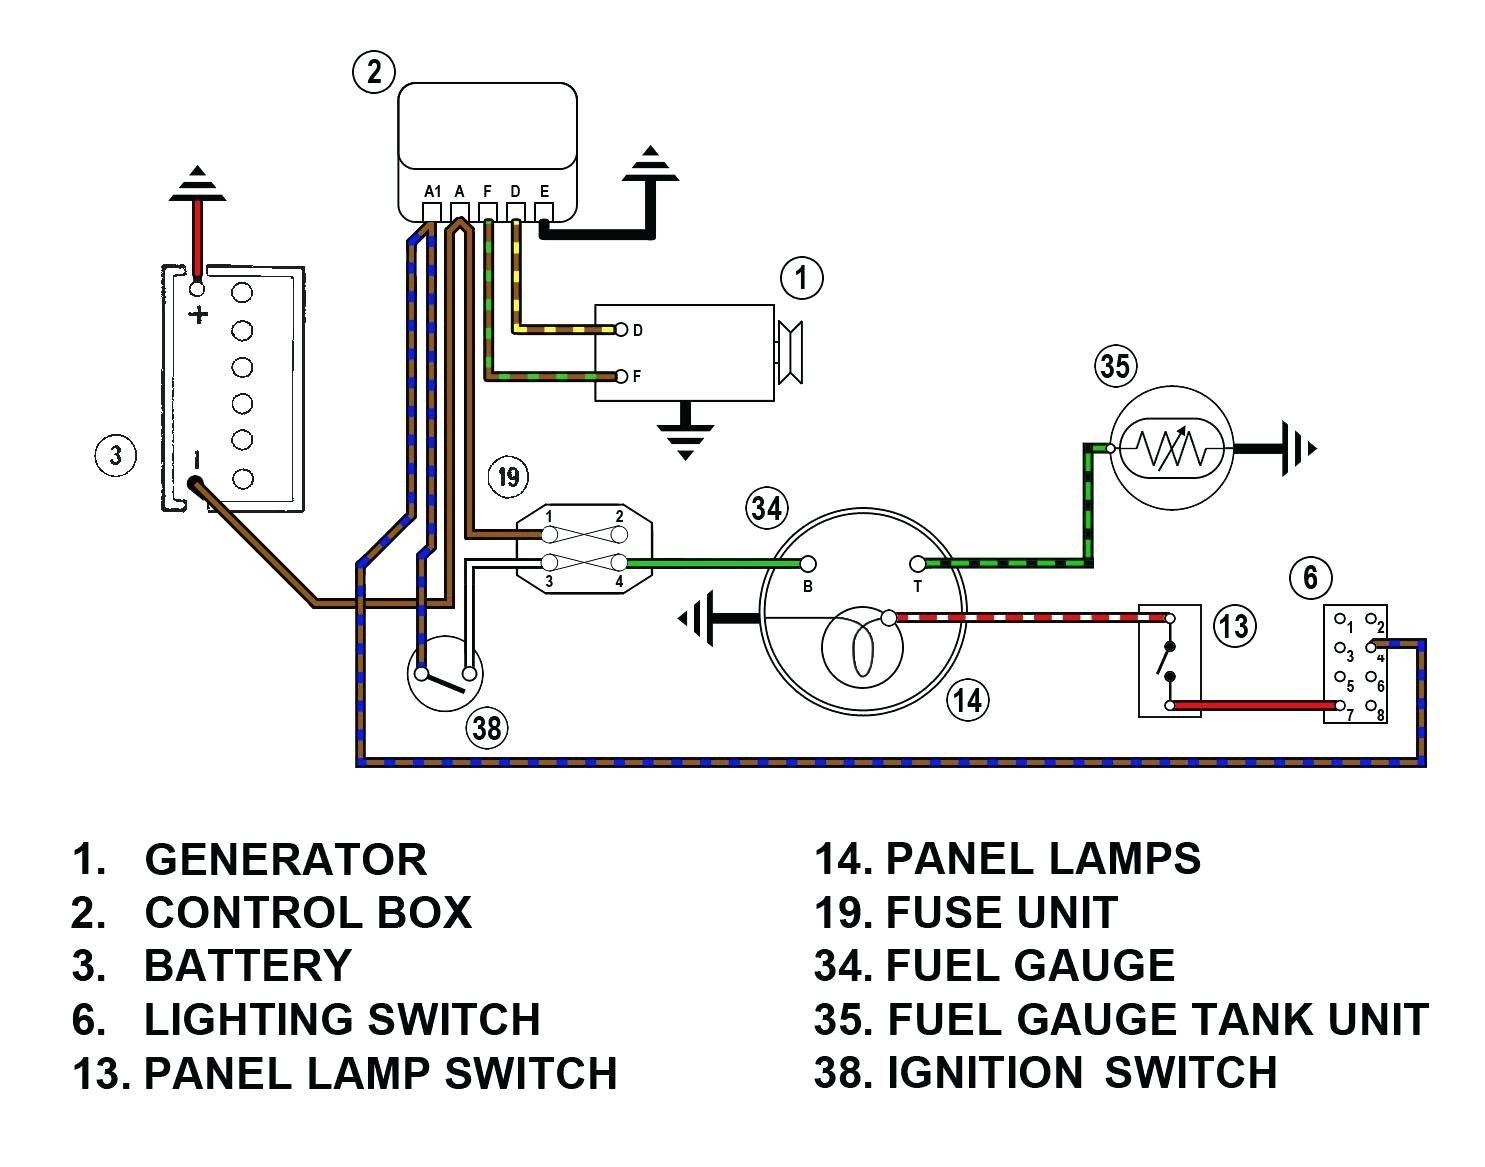 1957 Chevy Fuel Gauge Wiring Diagram 1999 Chevy Fuel Gauge Wiring Wiring Diagram Basic